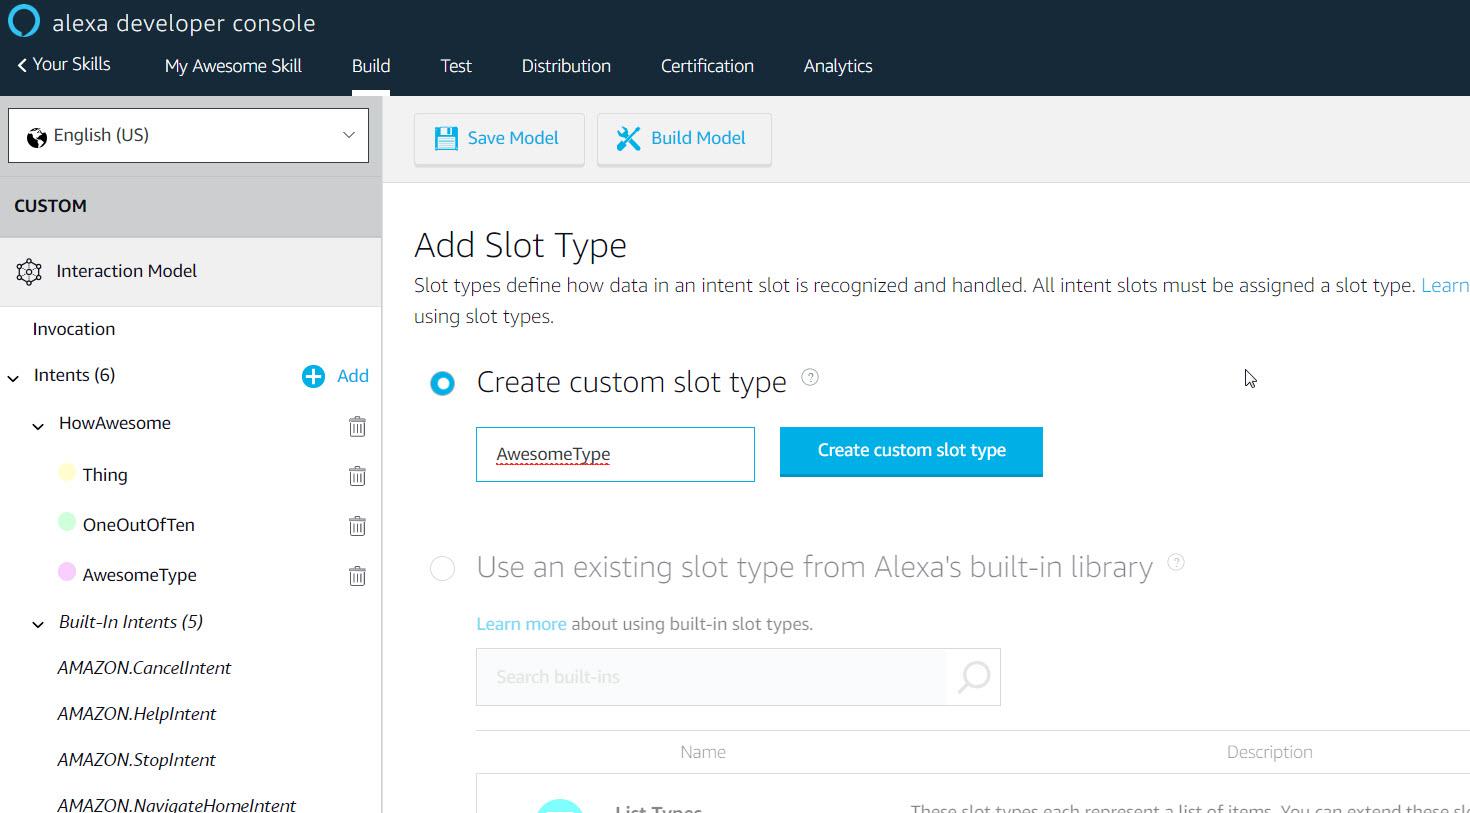 alexa-skills_slot-type-create